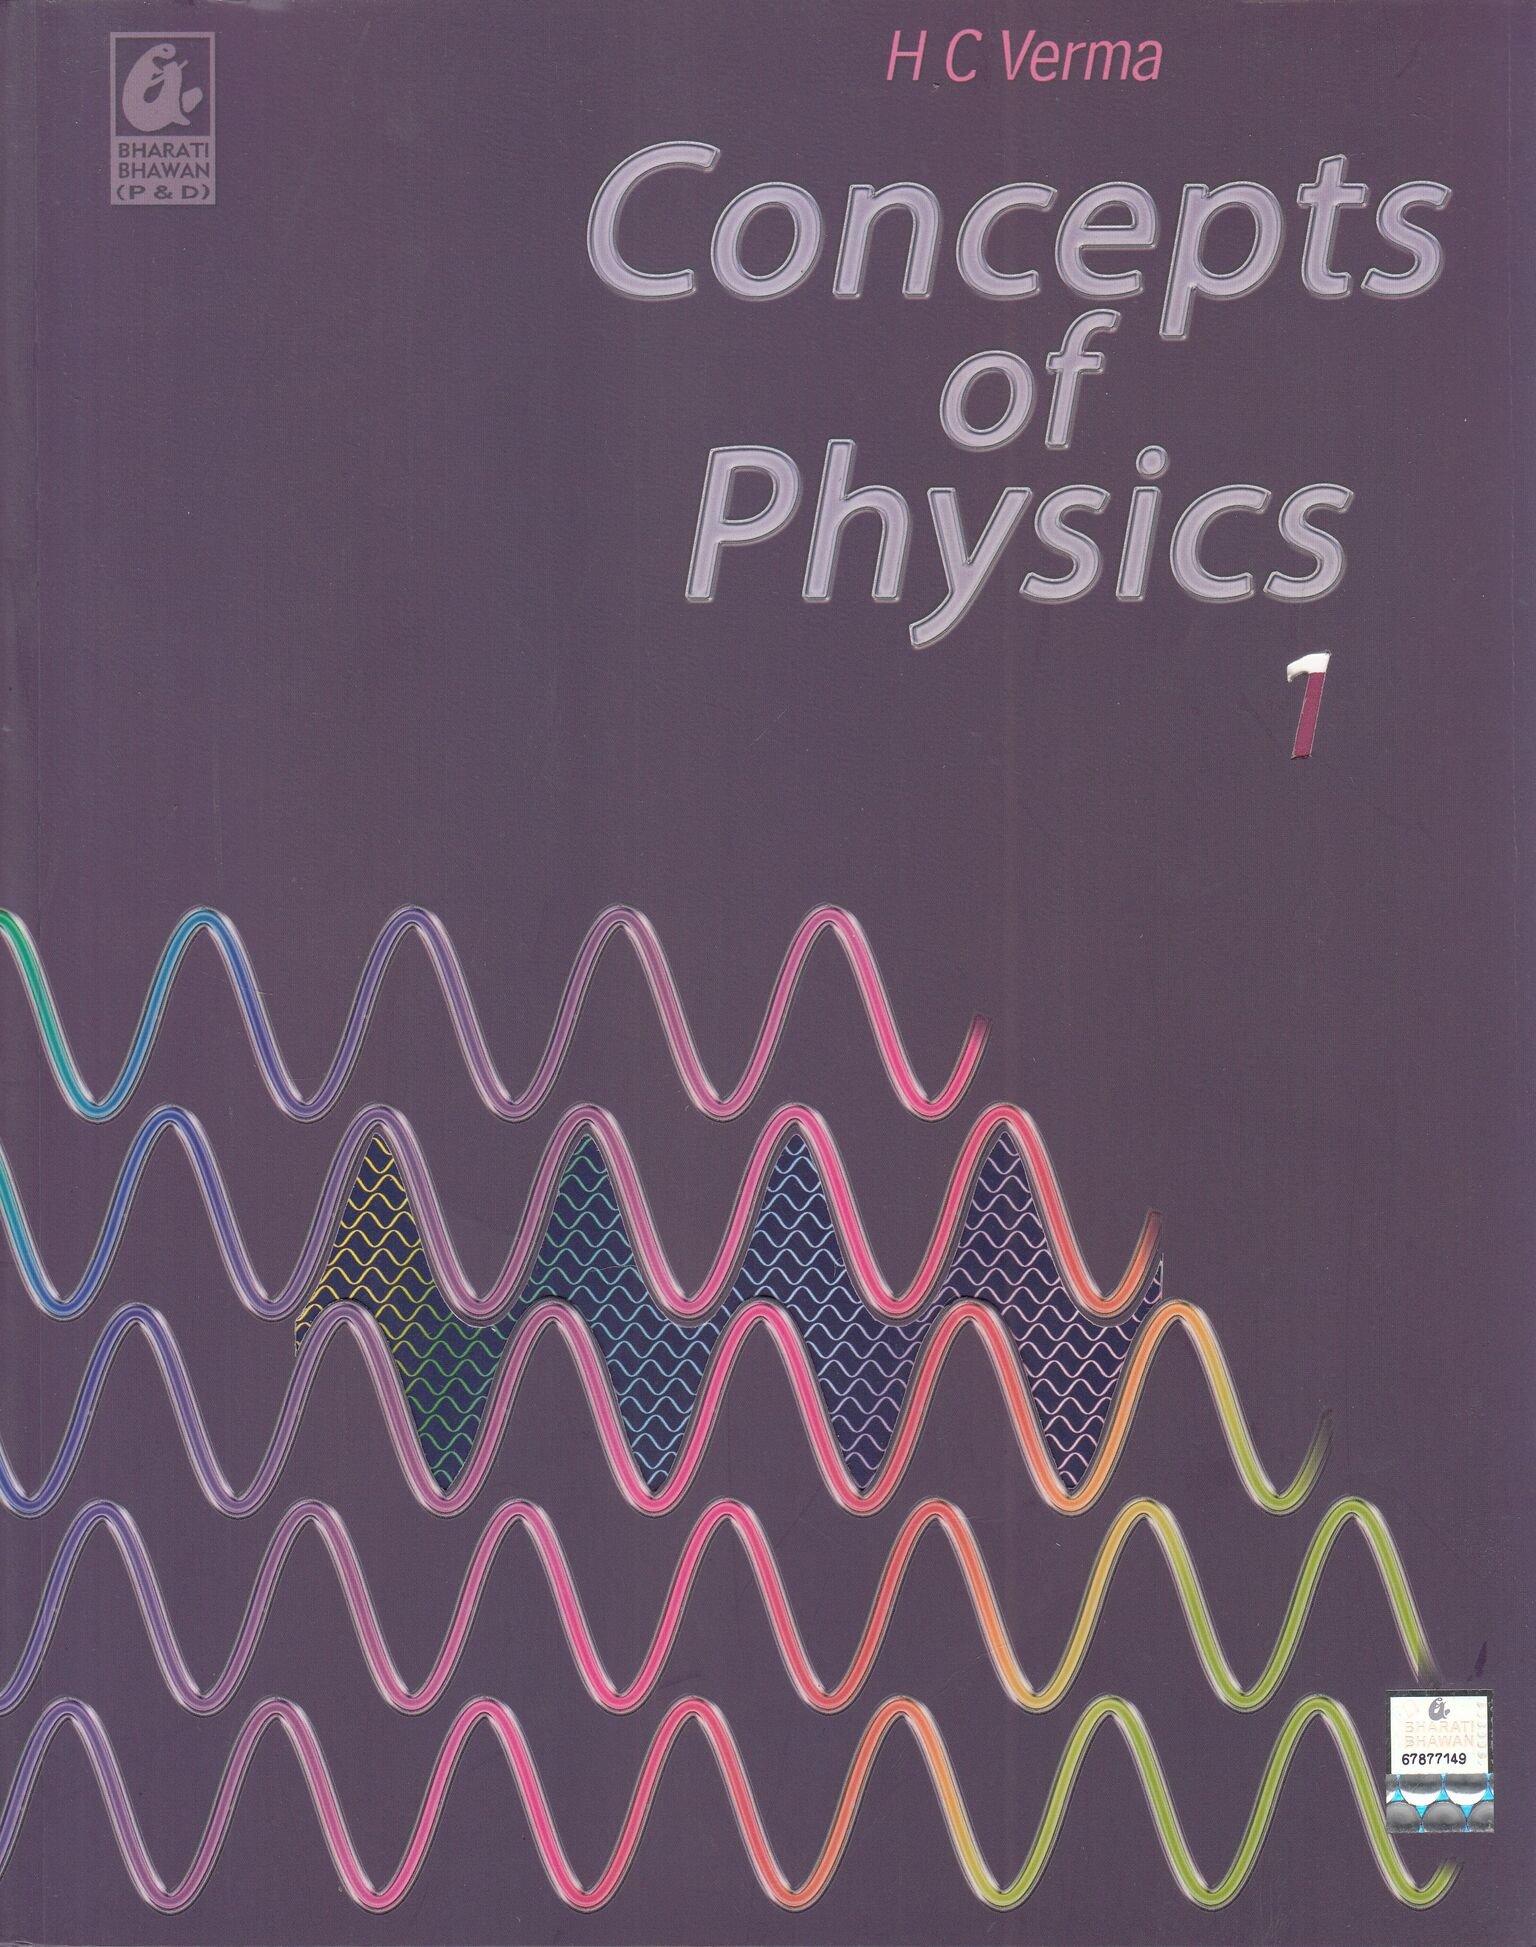 Concepts of physics 1 amazon hc verma books fandeluxe Gallery